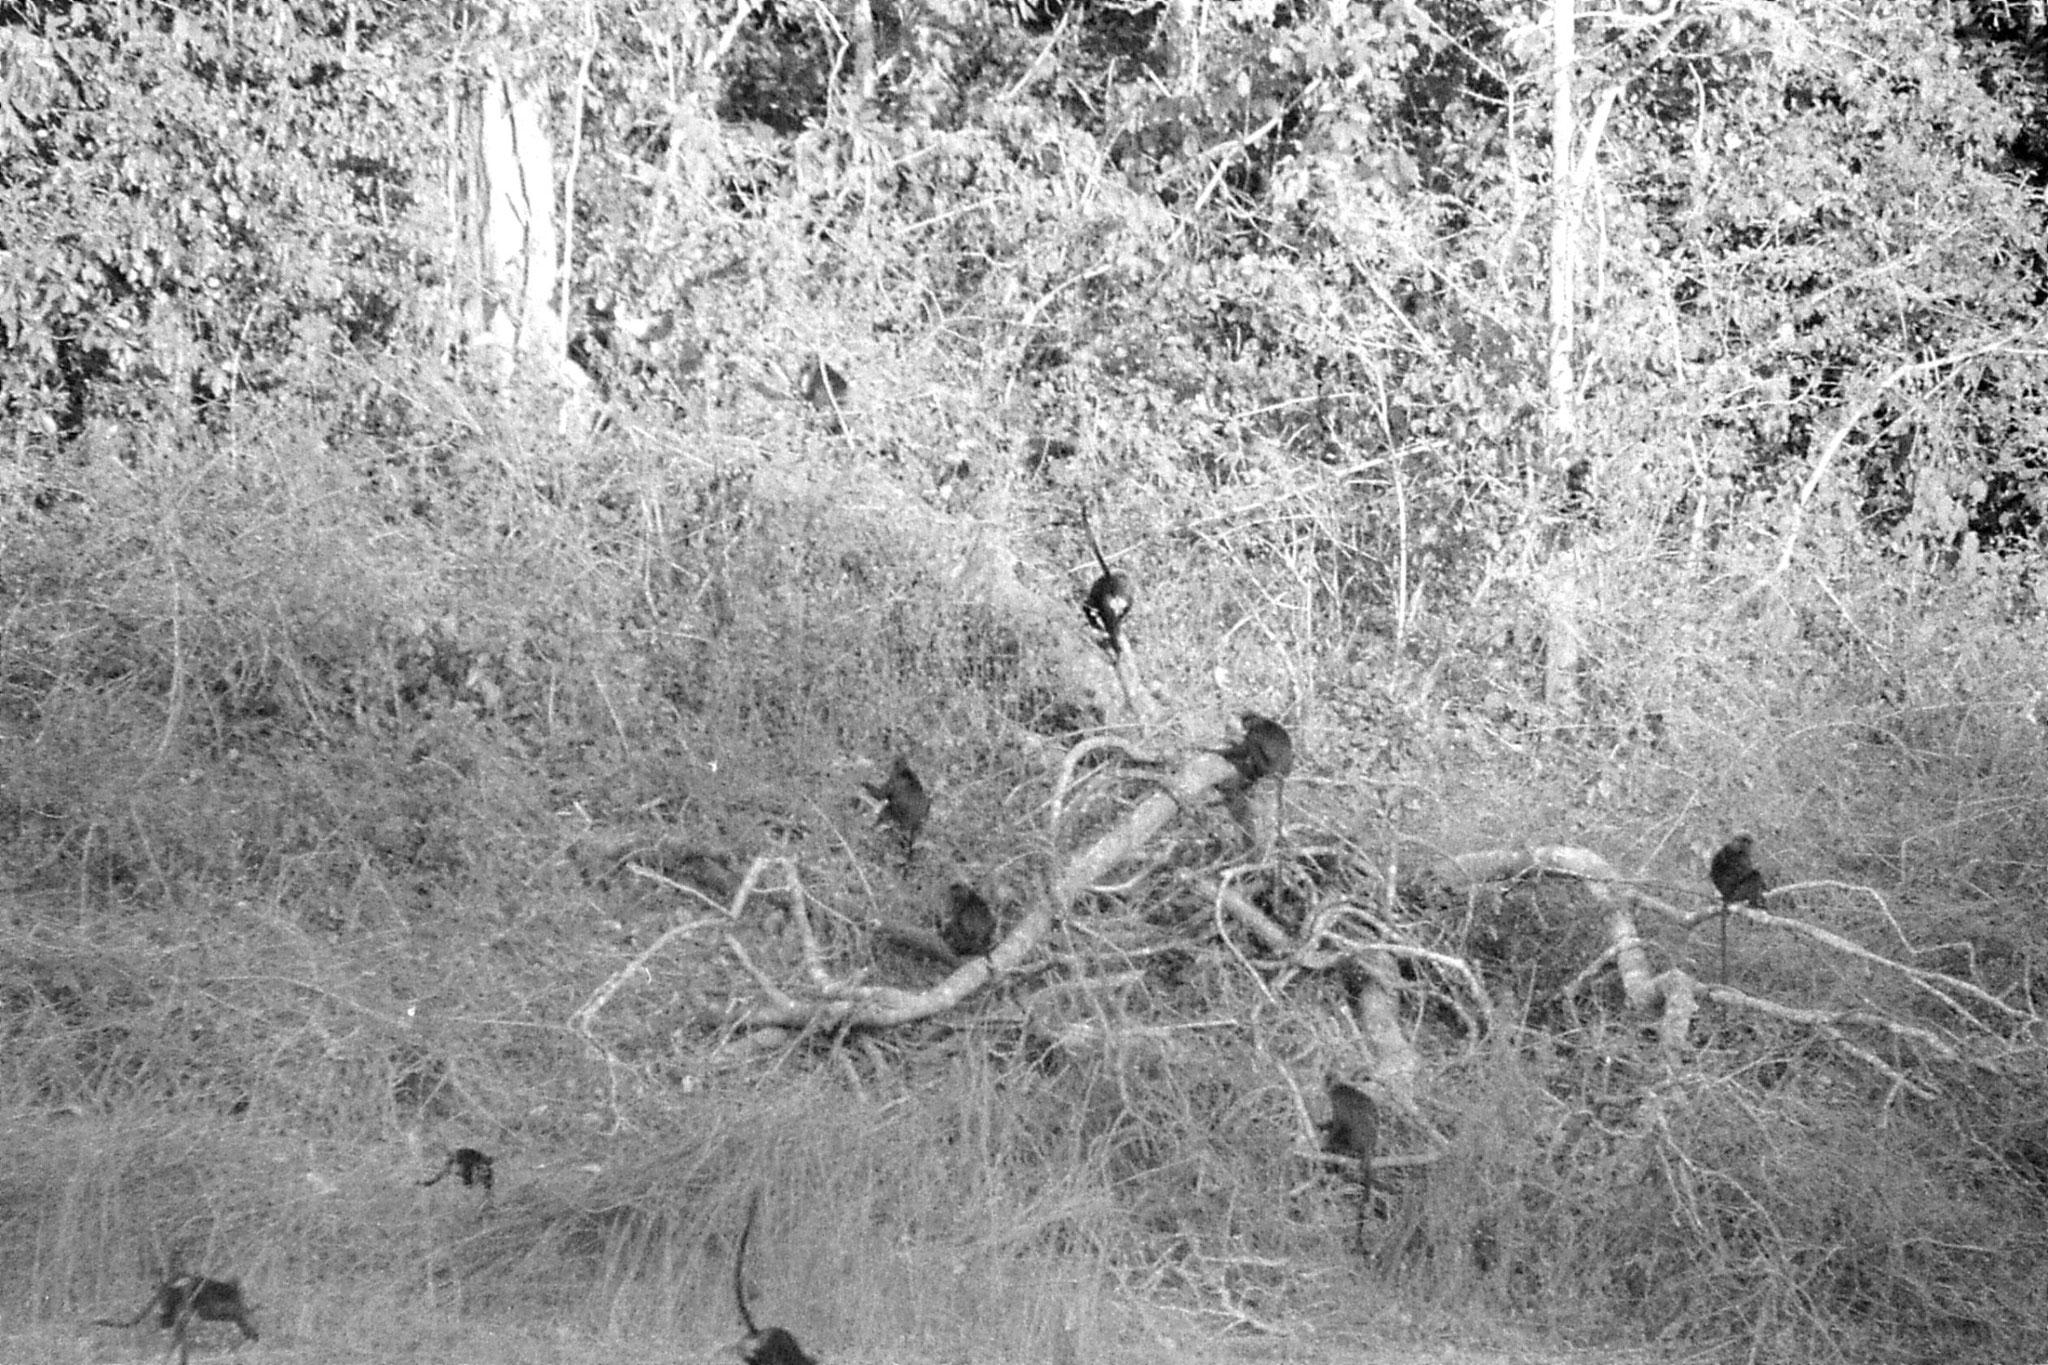 097/22: 22/2/1990 Periyars black langurs